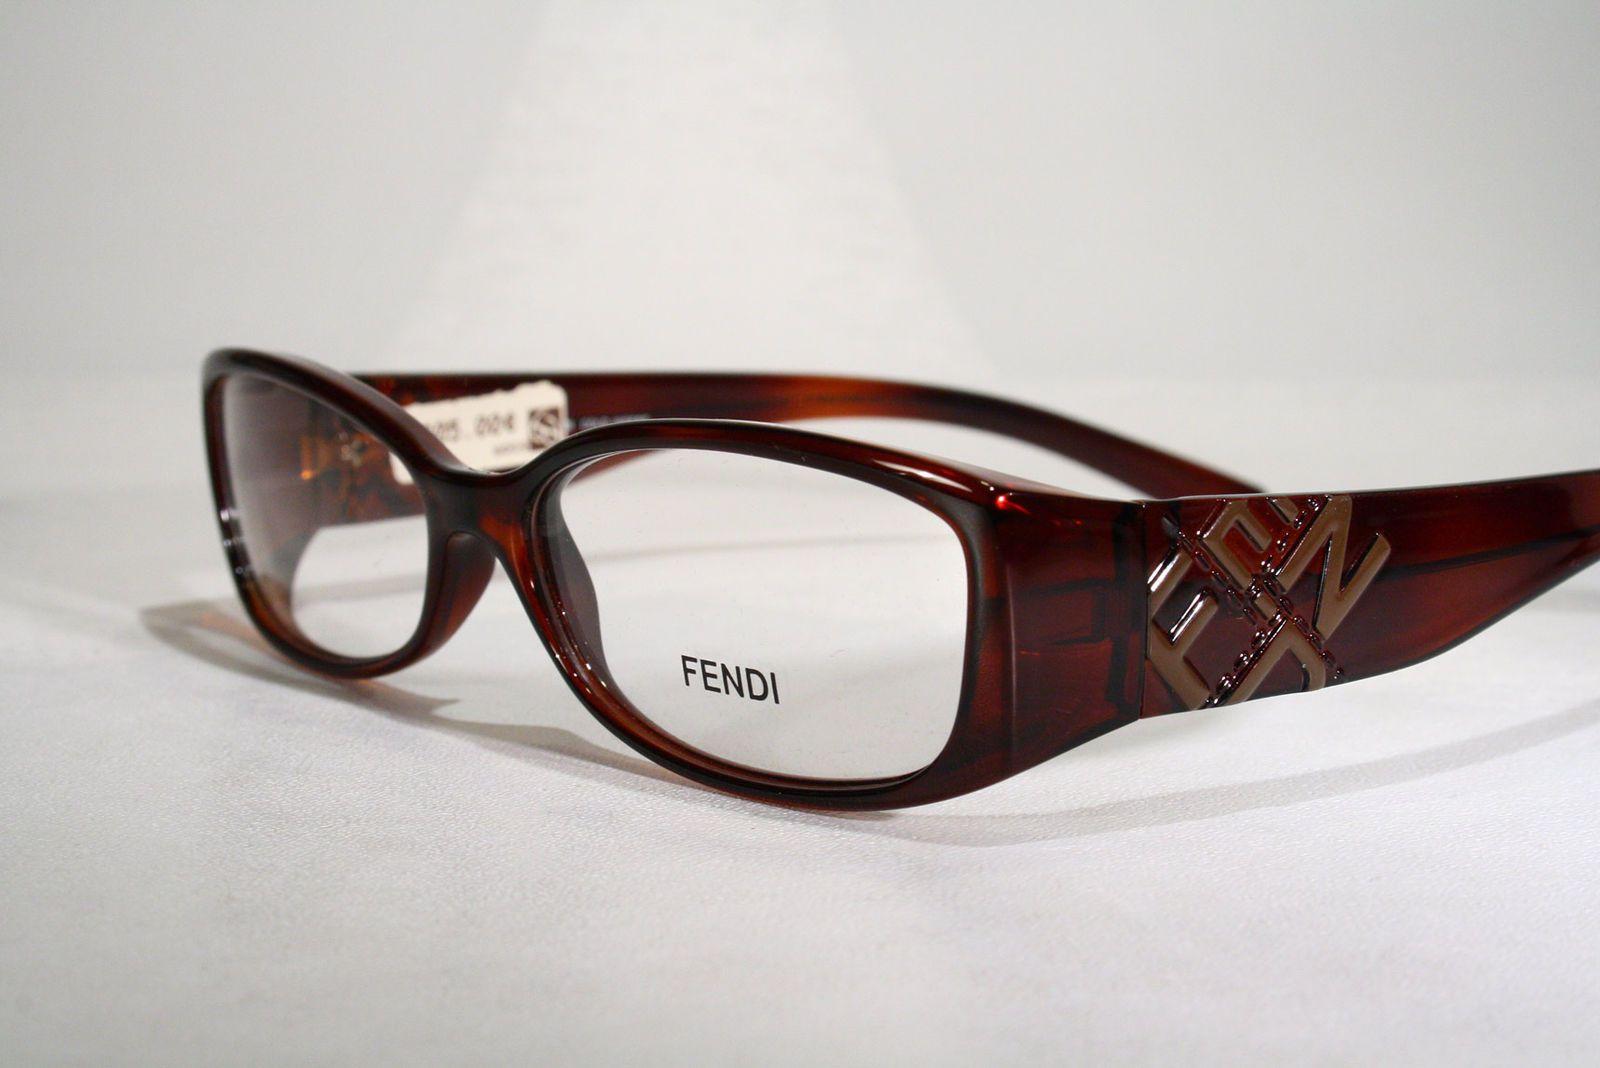 b7963f26a00 Women s FENDI Italy F737 Slim Translucent Brown Eyeglasses Glasses Frames +  Case   eBay (RipVanW)